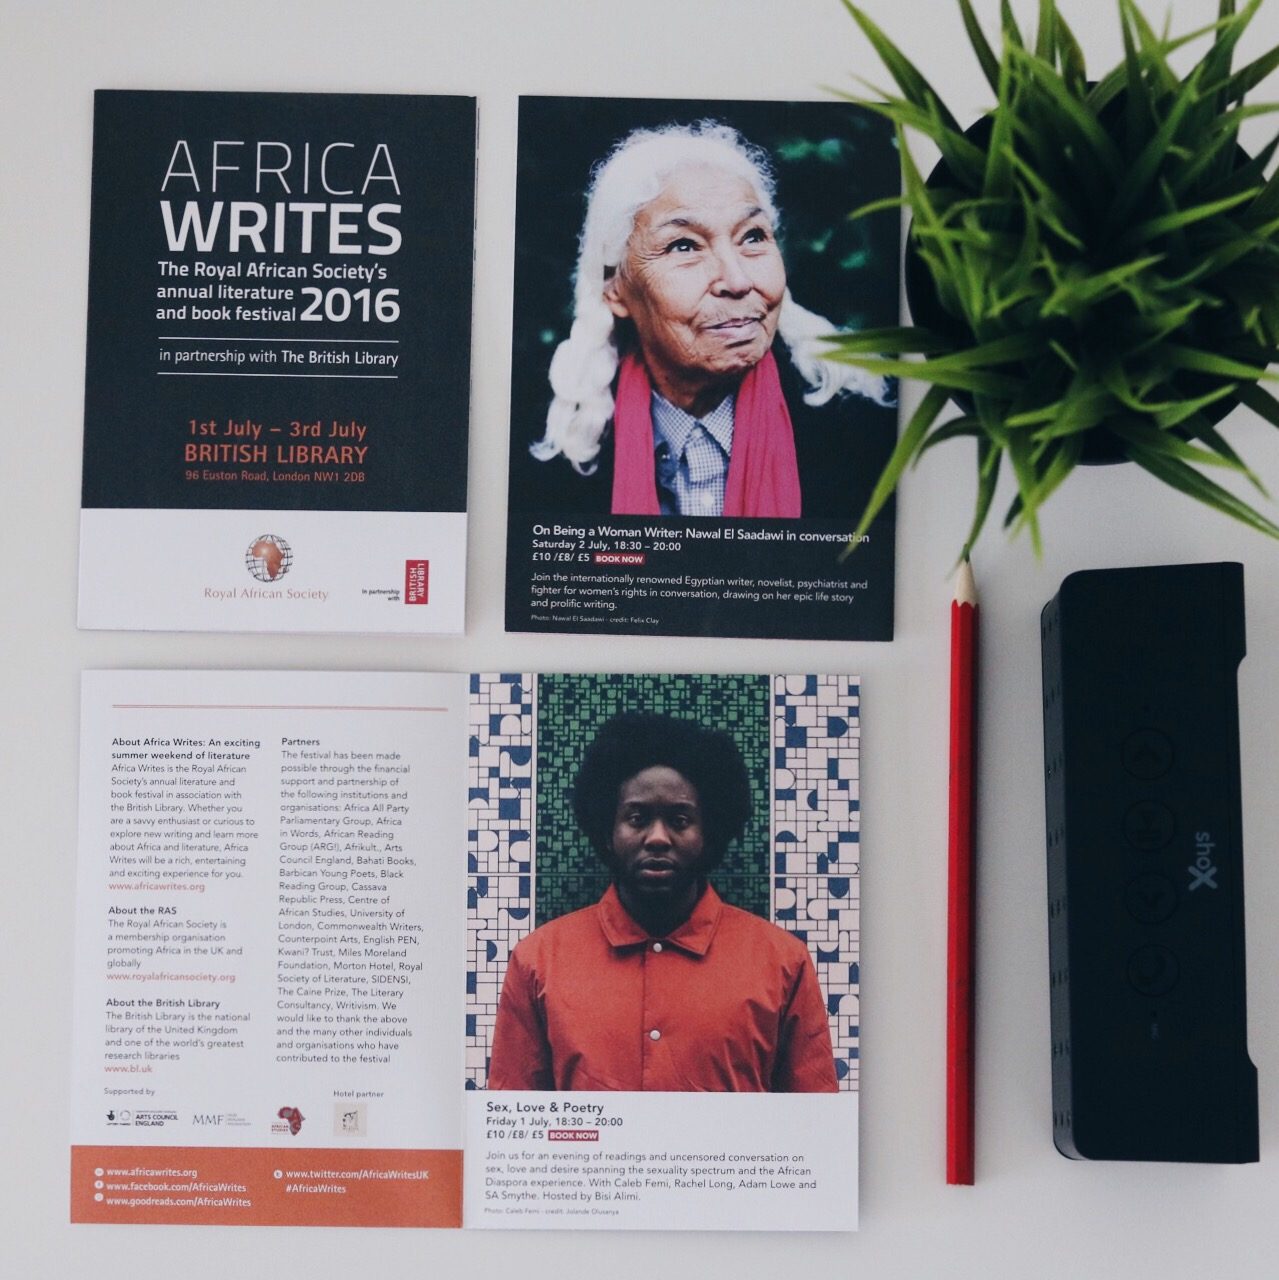 Africa Writes 2016